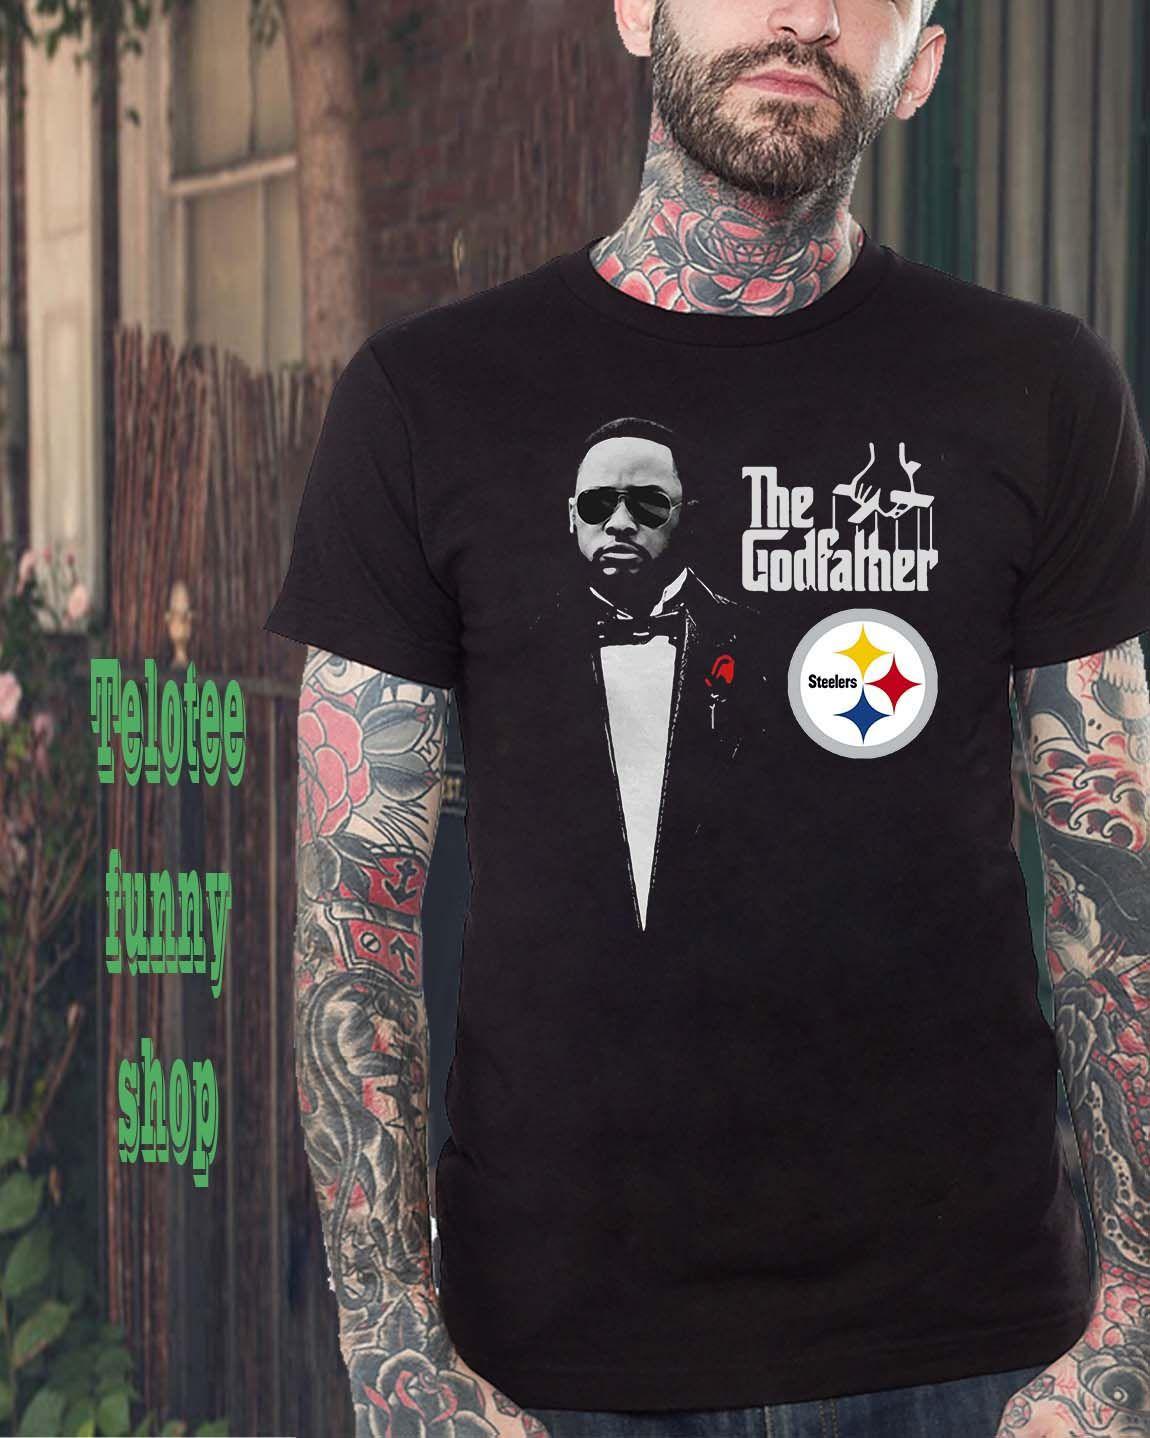 2316249da09 Mike Tomlin The Godfather Pittsburgh Steelers shirt